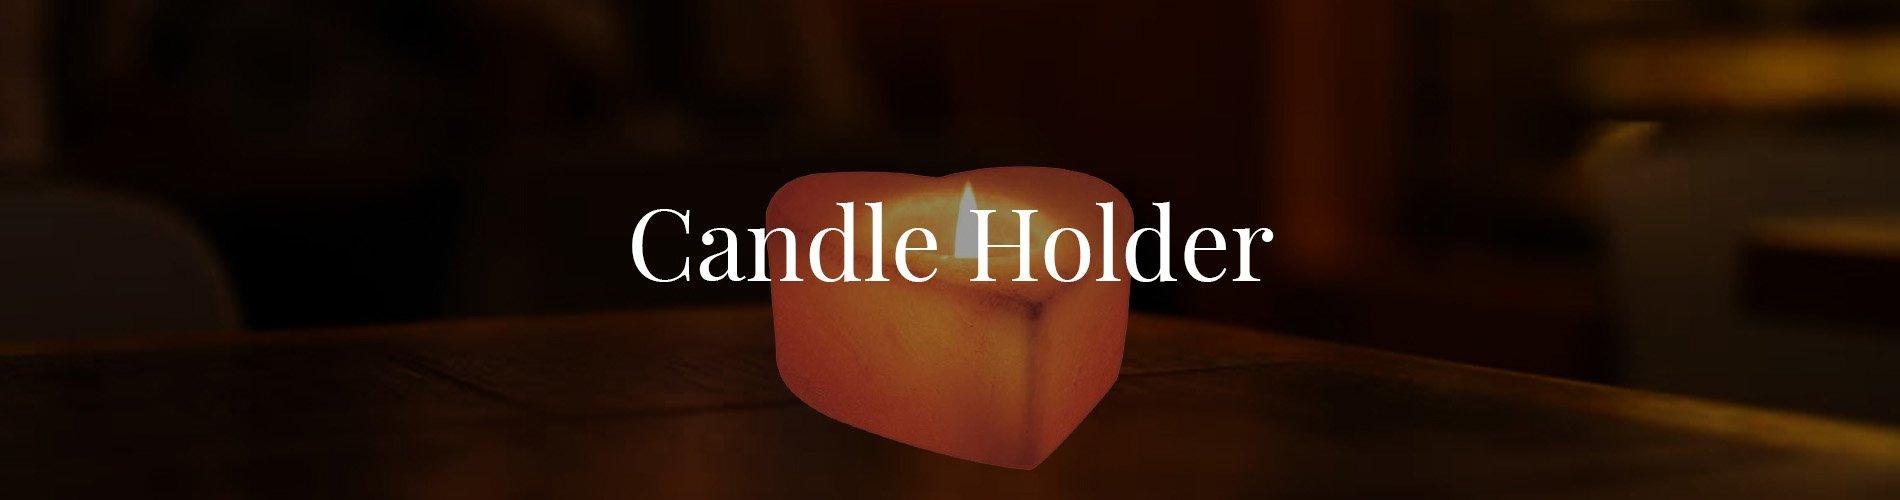 Candle Holder Lamp background